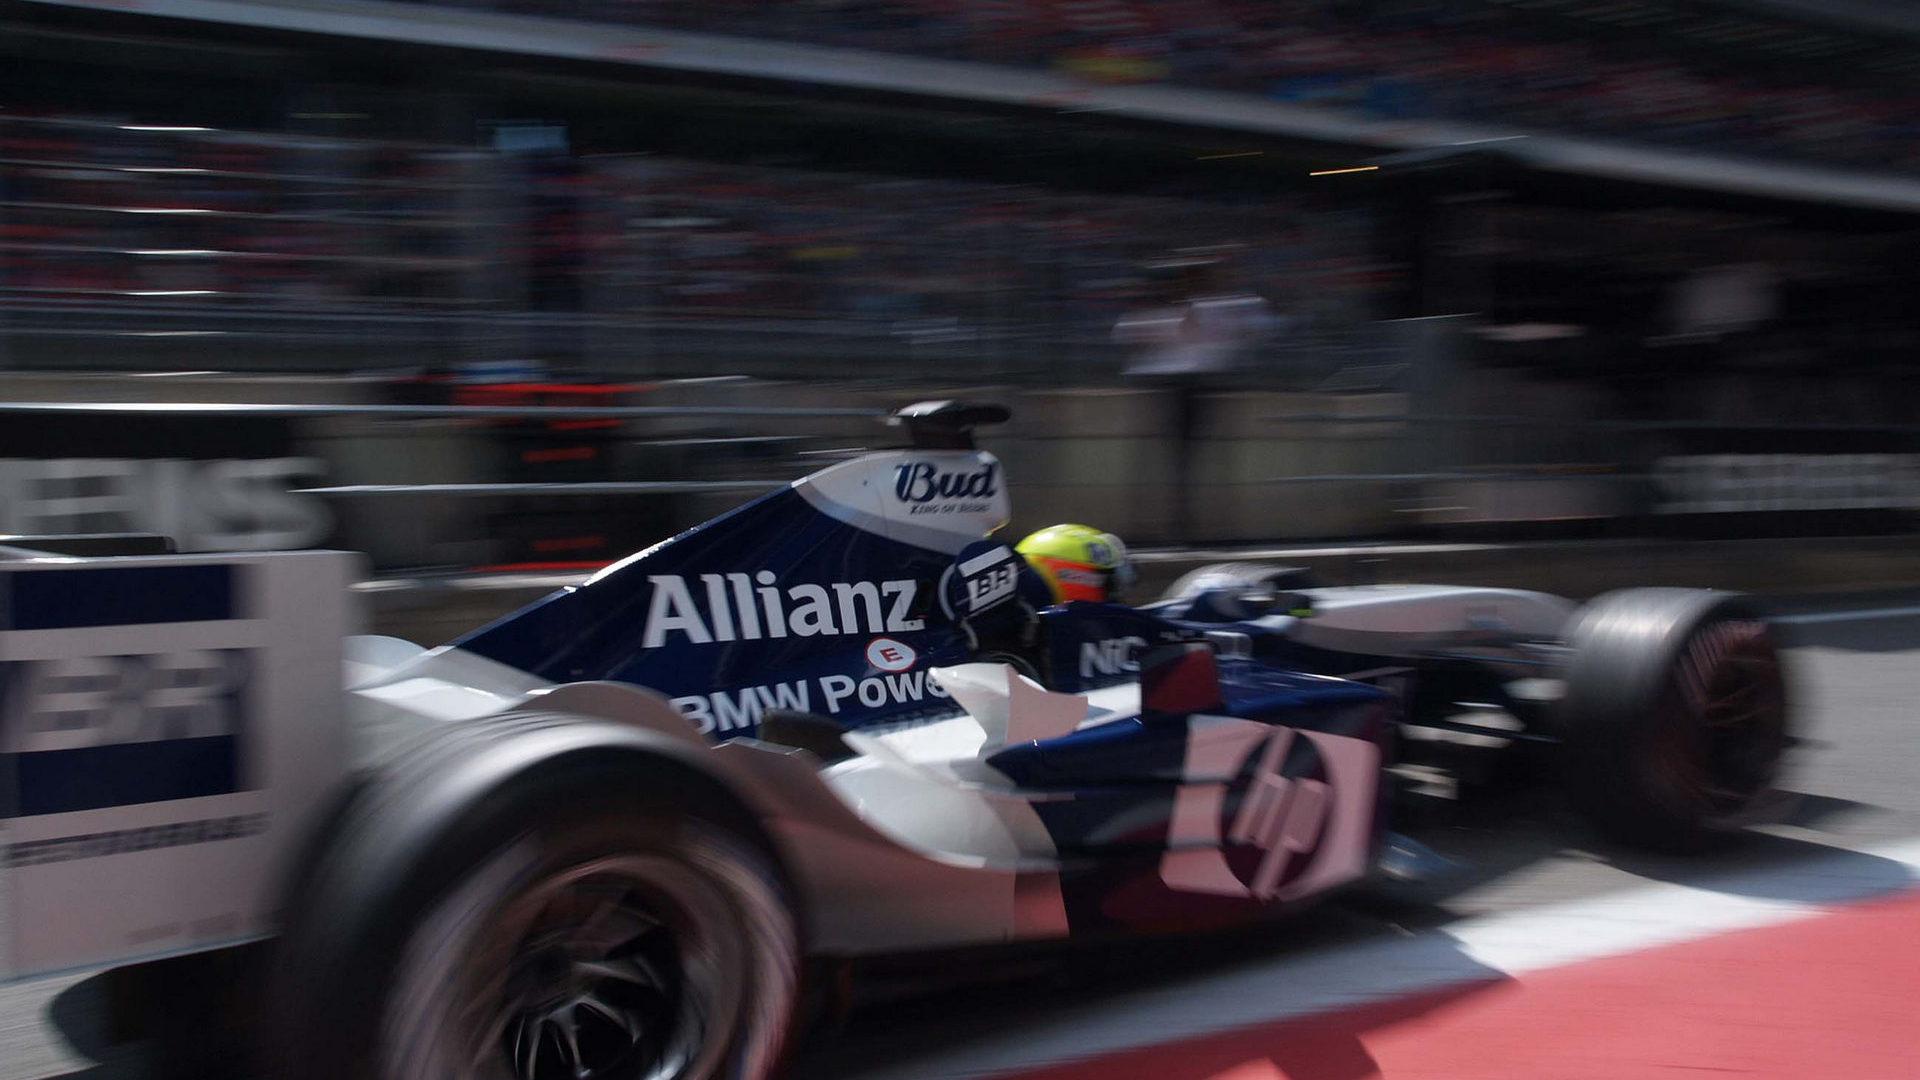 HD Wallpapers 2004 Formula 1 Grand Prix of Spain  F1